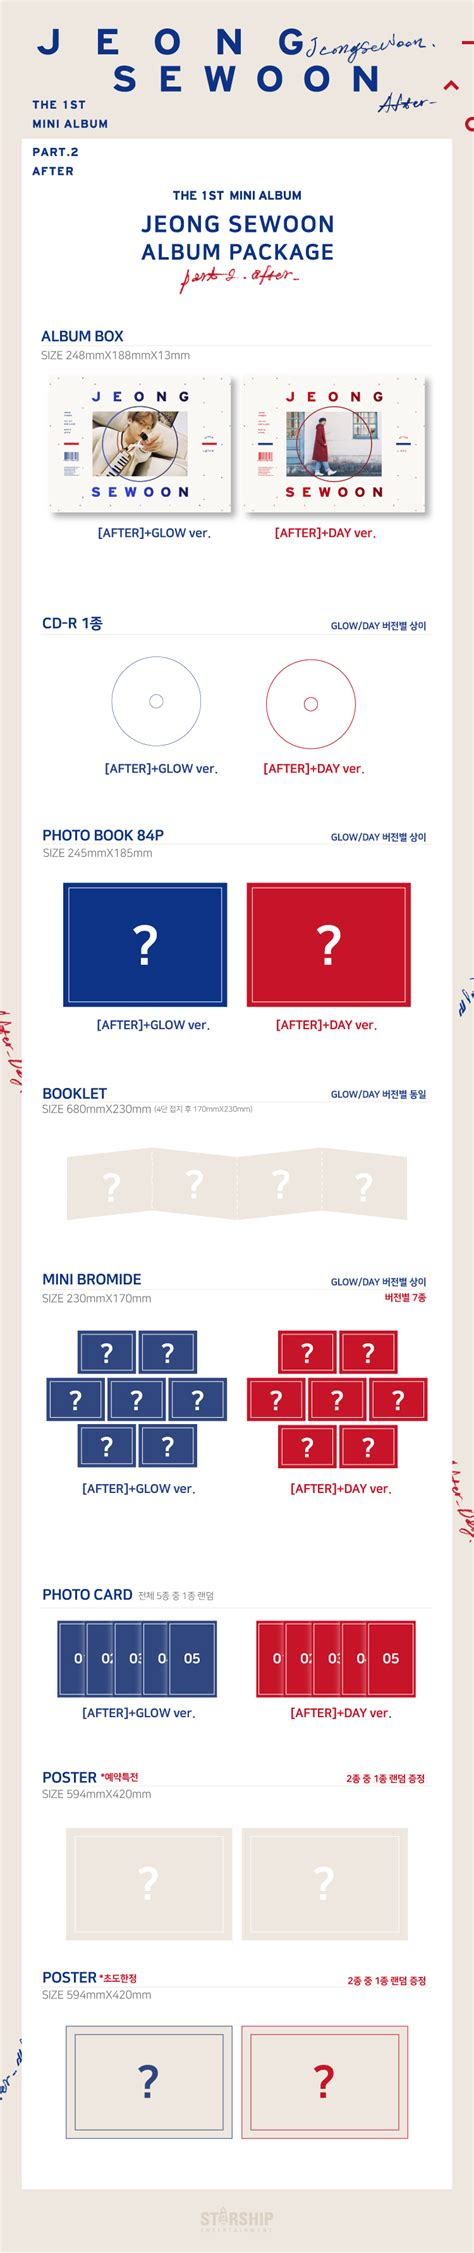 Pre Order 80 Part 2 정세운jeong Se Woon Mini Album Vol 1 Part 2 After 1cd 2